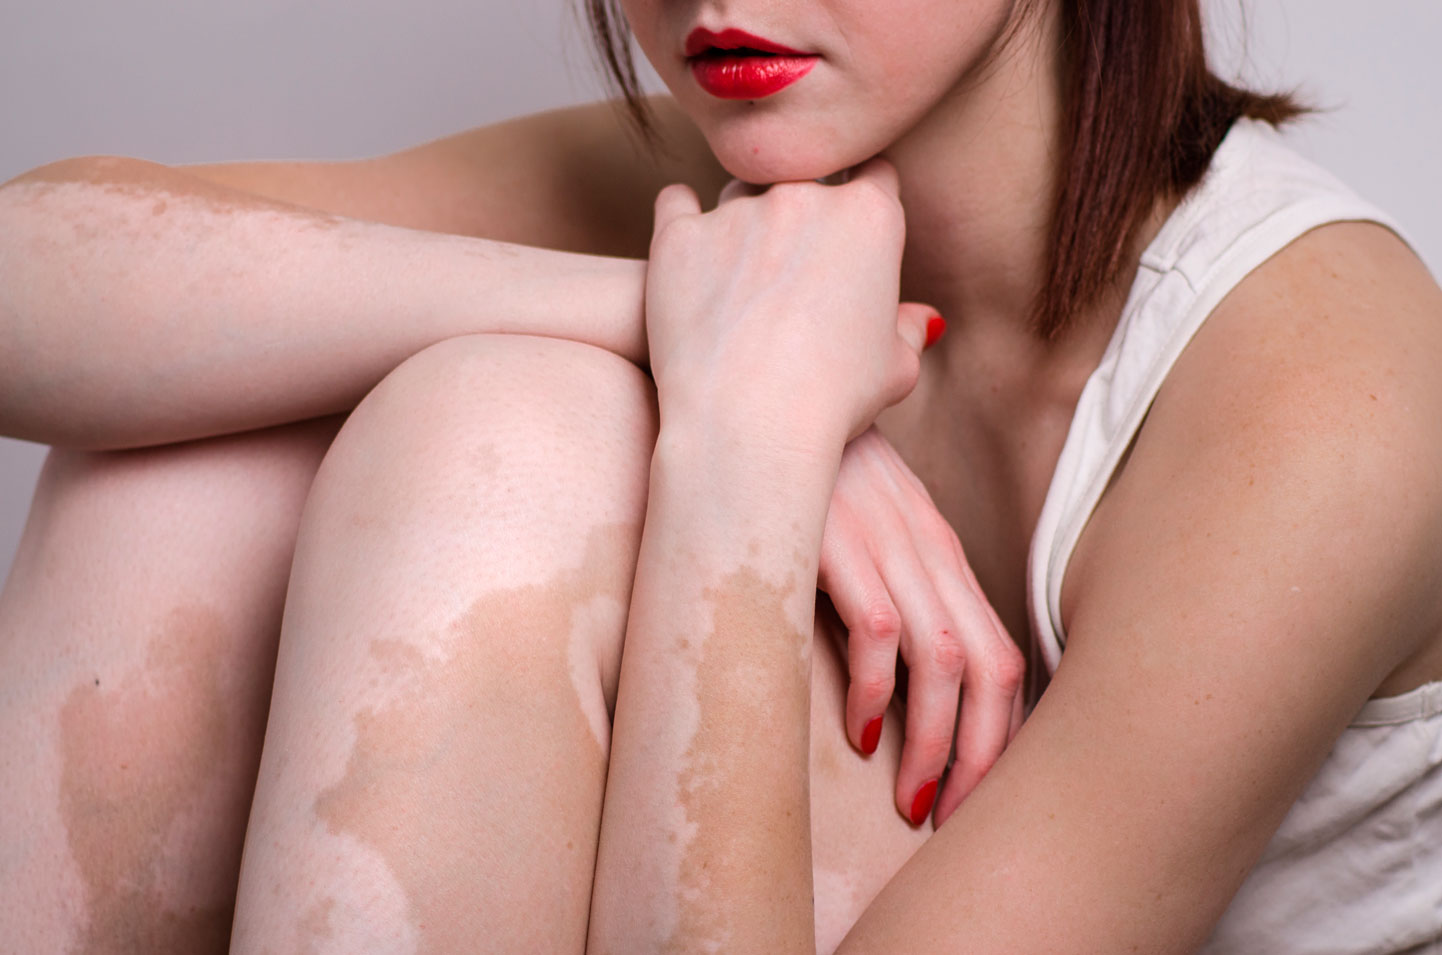 vitiligo-piel-sol-verano-manchas-despigmentacion-piel-puvaterapia-blancas-fototerapia-dermatologia-dermatologo-dr-lopez-gil-dermandtek-teknon-barcelona